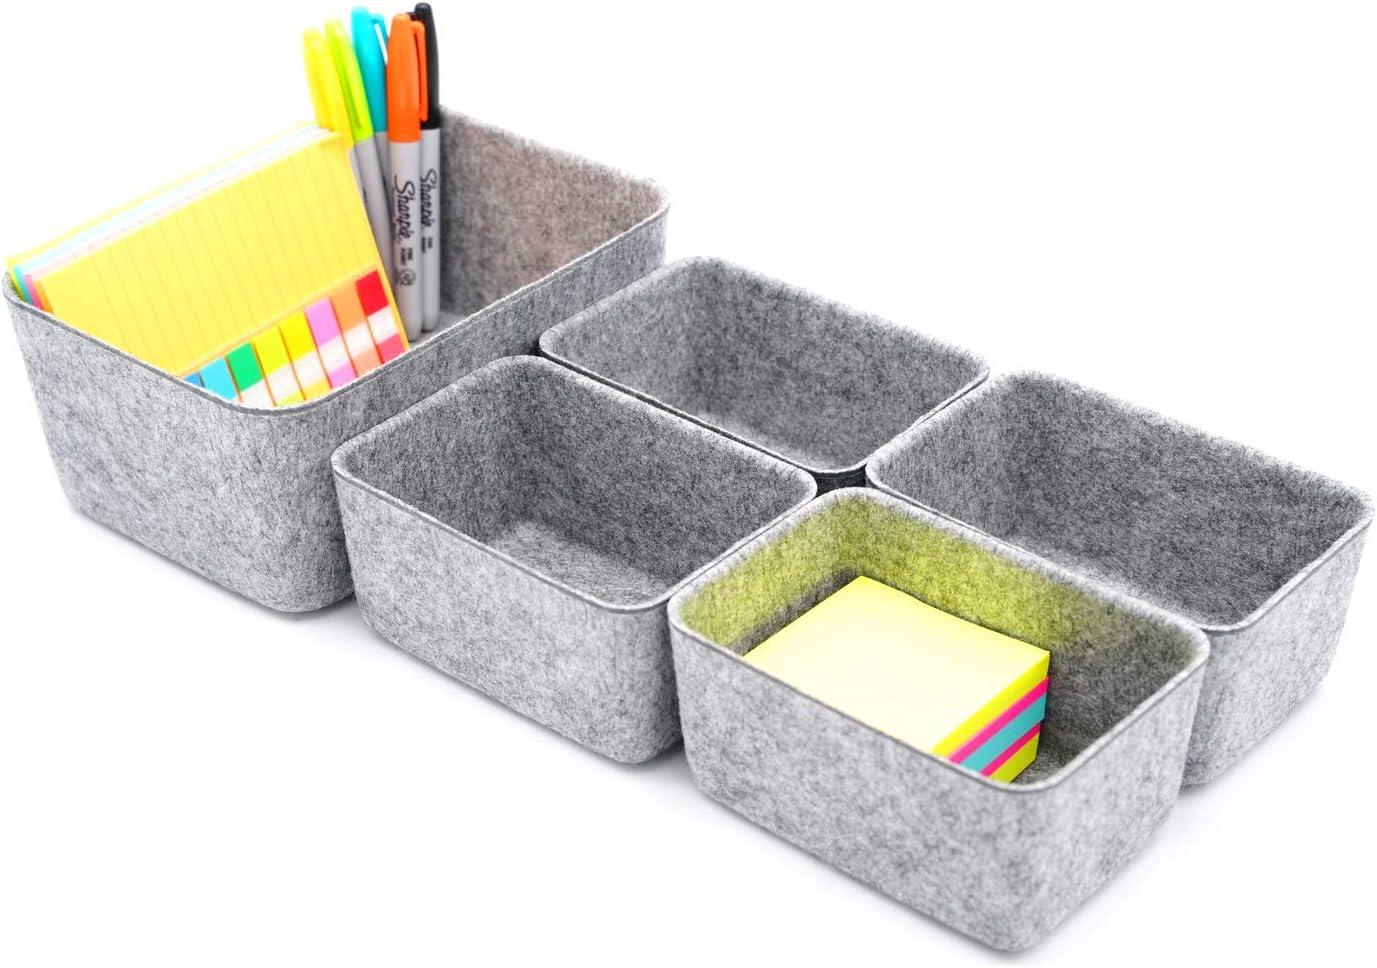 Welaxy Drawer organizers dividers storage bins office organizer bin gifts ideas, 5 pack (Gray)